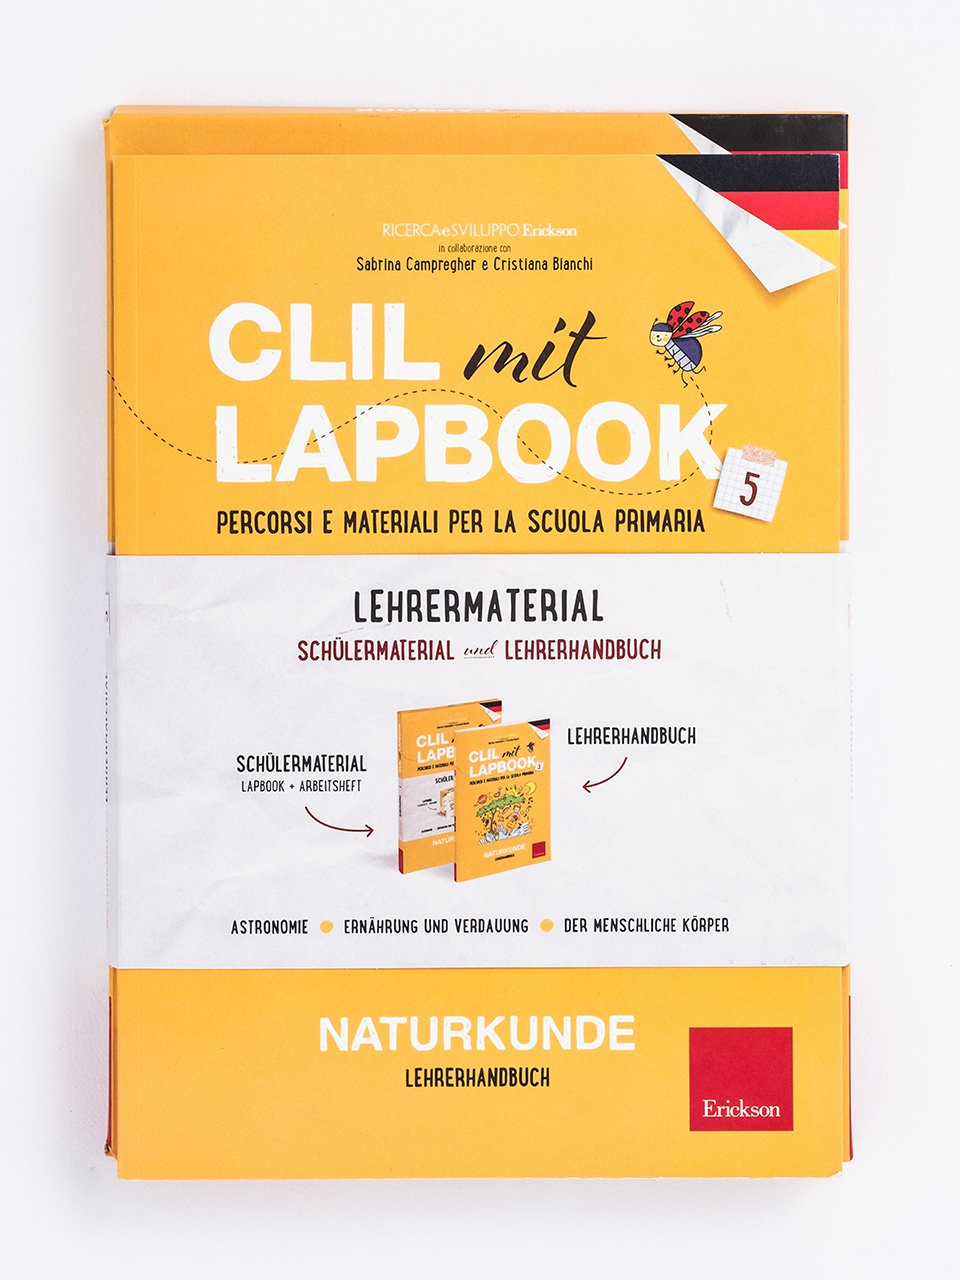 CLIL mit LAPBOOK - Naturkunde - Classe quinta - Ricerca e Sviluppo Erickson  - Erickson